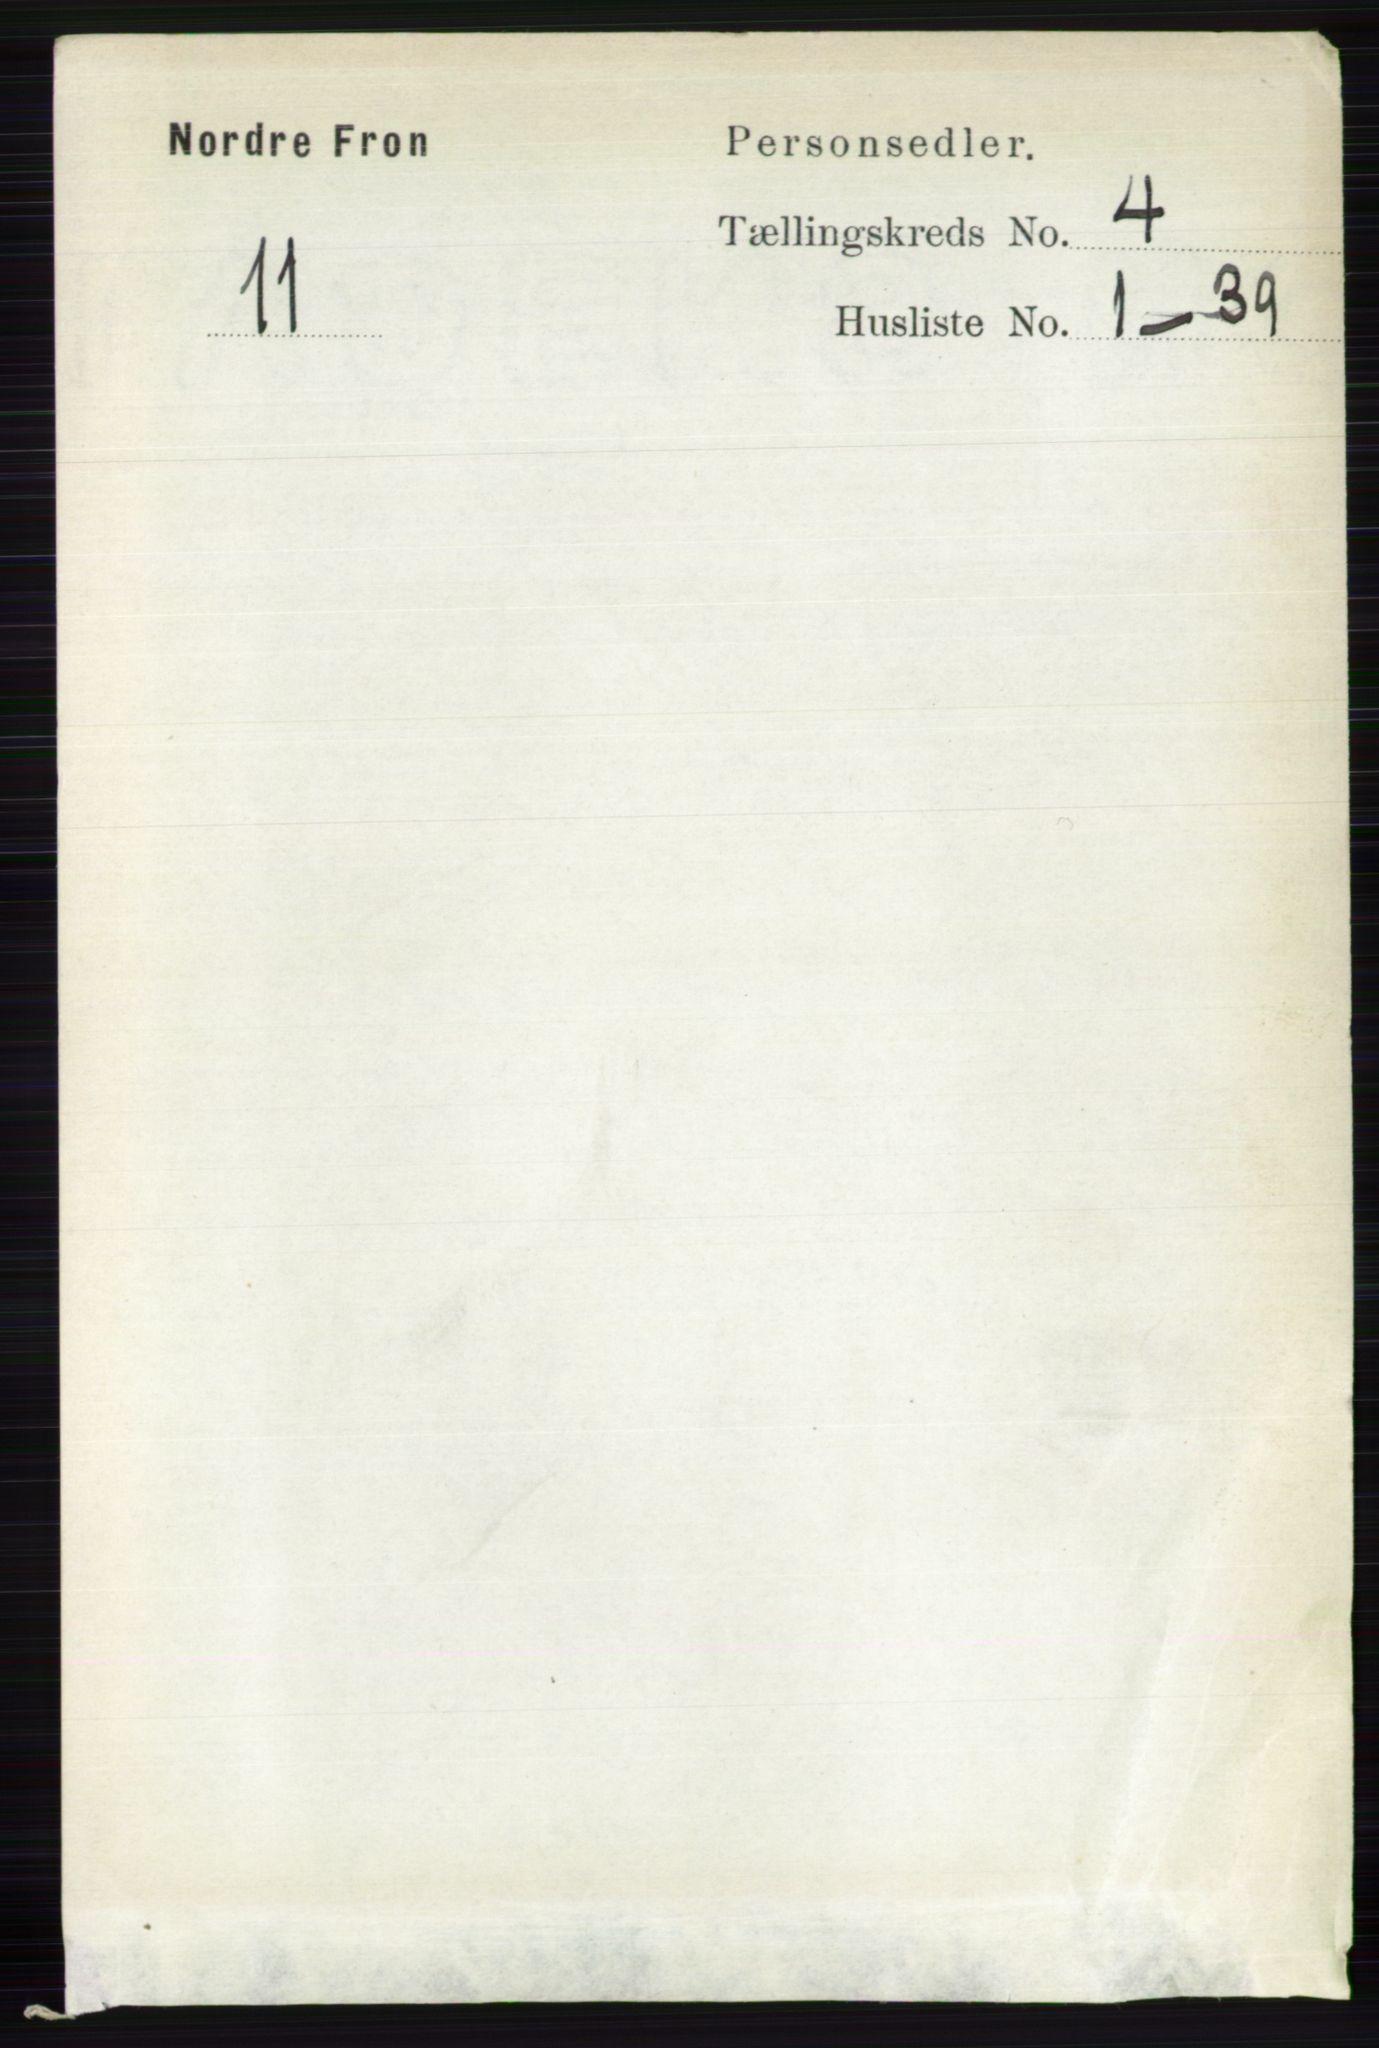 RA, Folketelling 1891 for 0518 Nord-Fron herred, 1891, s. 1460